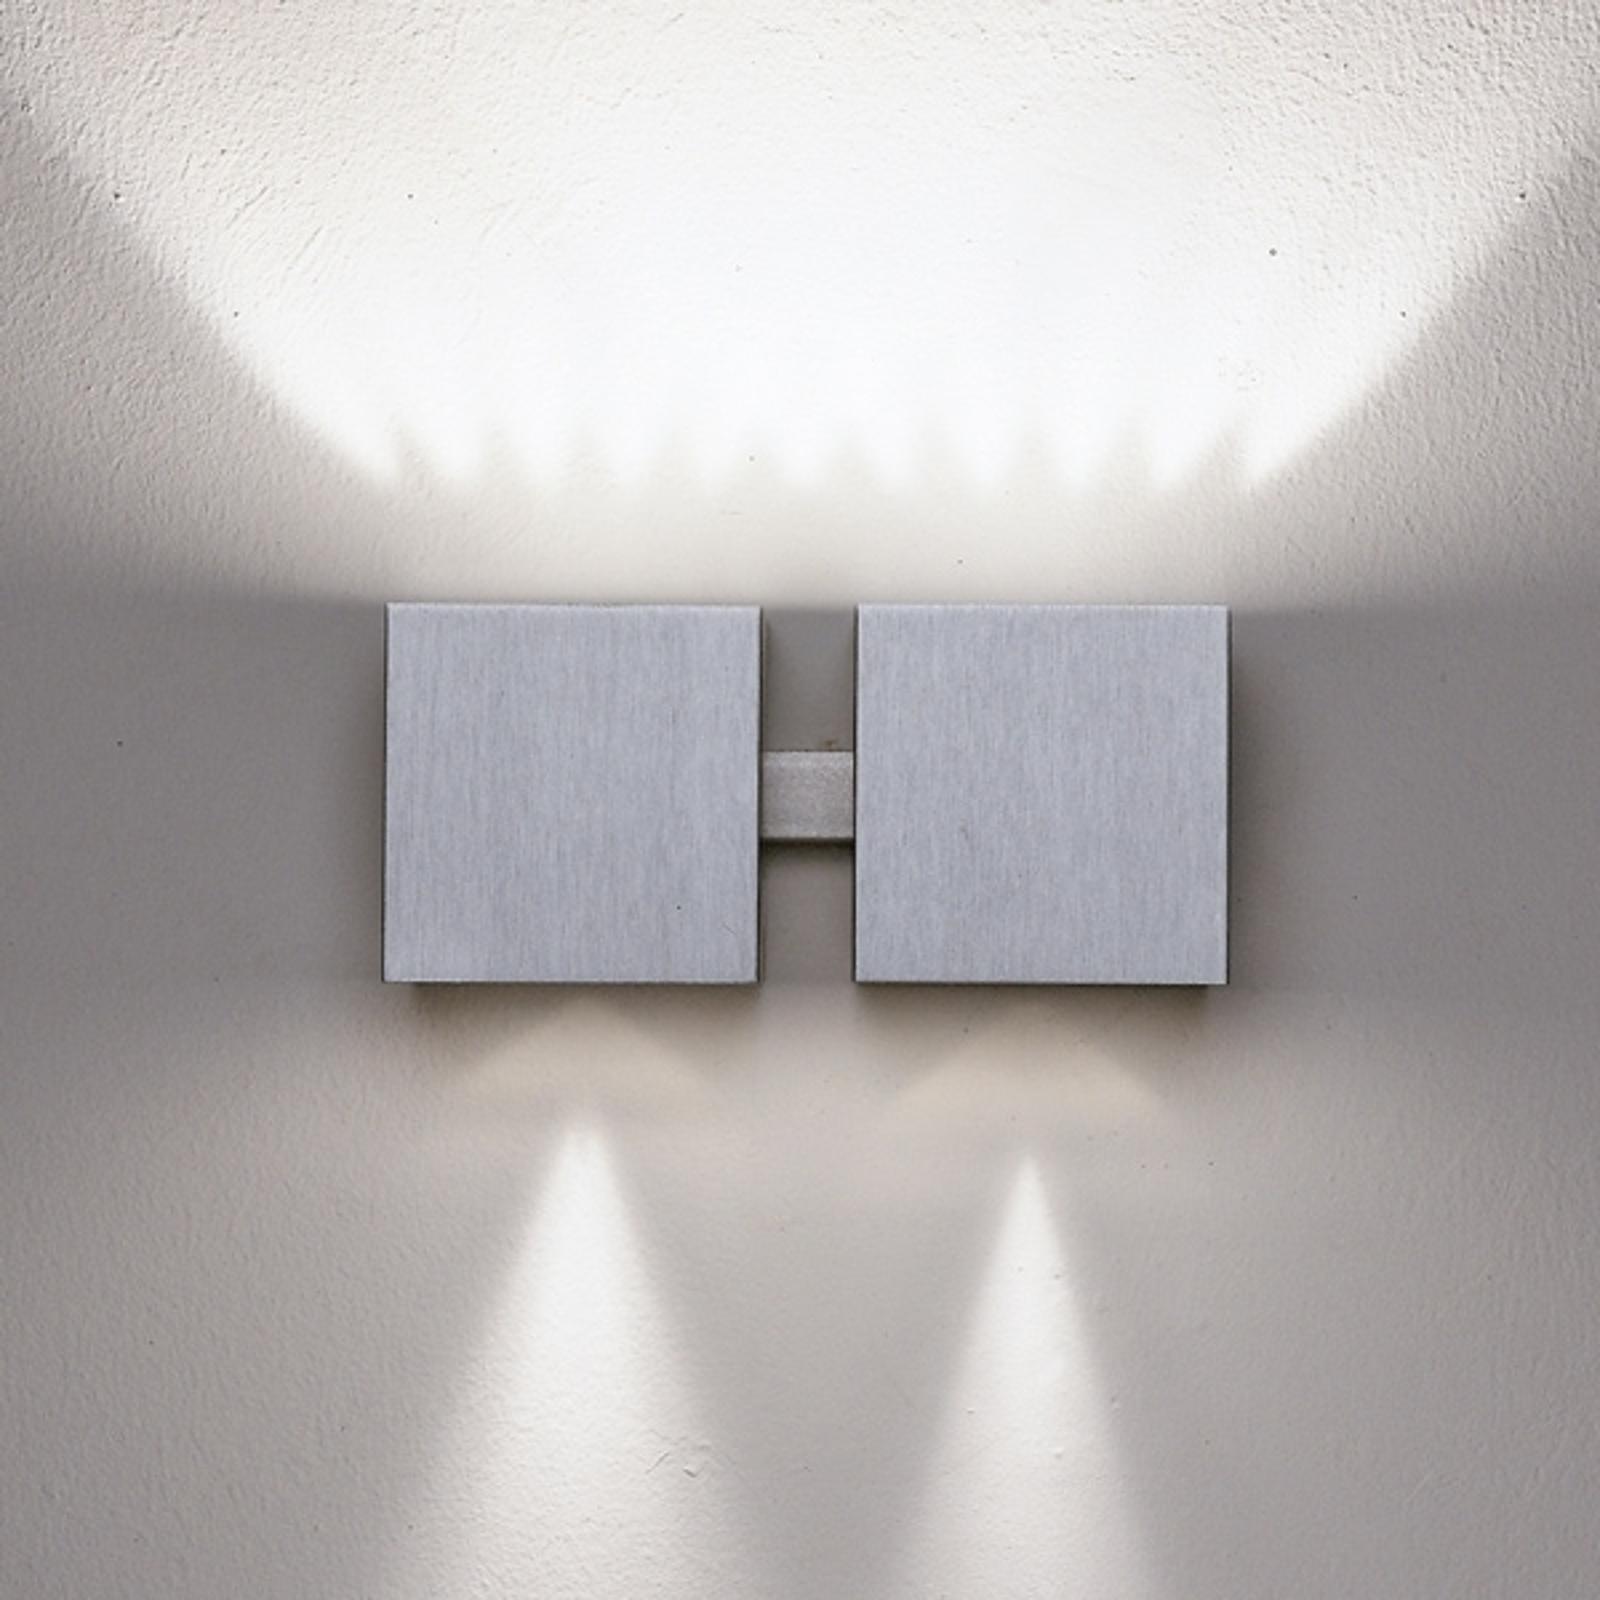 Wandlamp Dau up-down. aluminium. 2-lichts